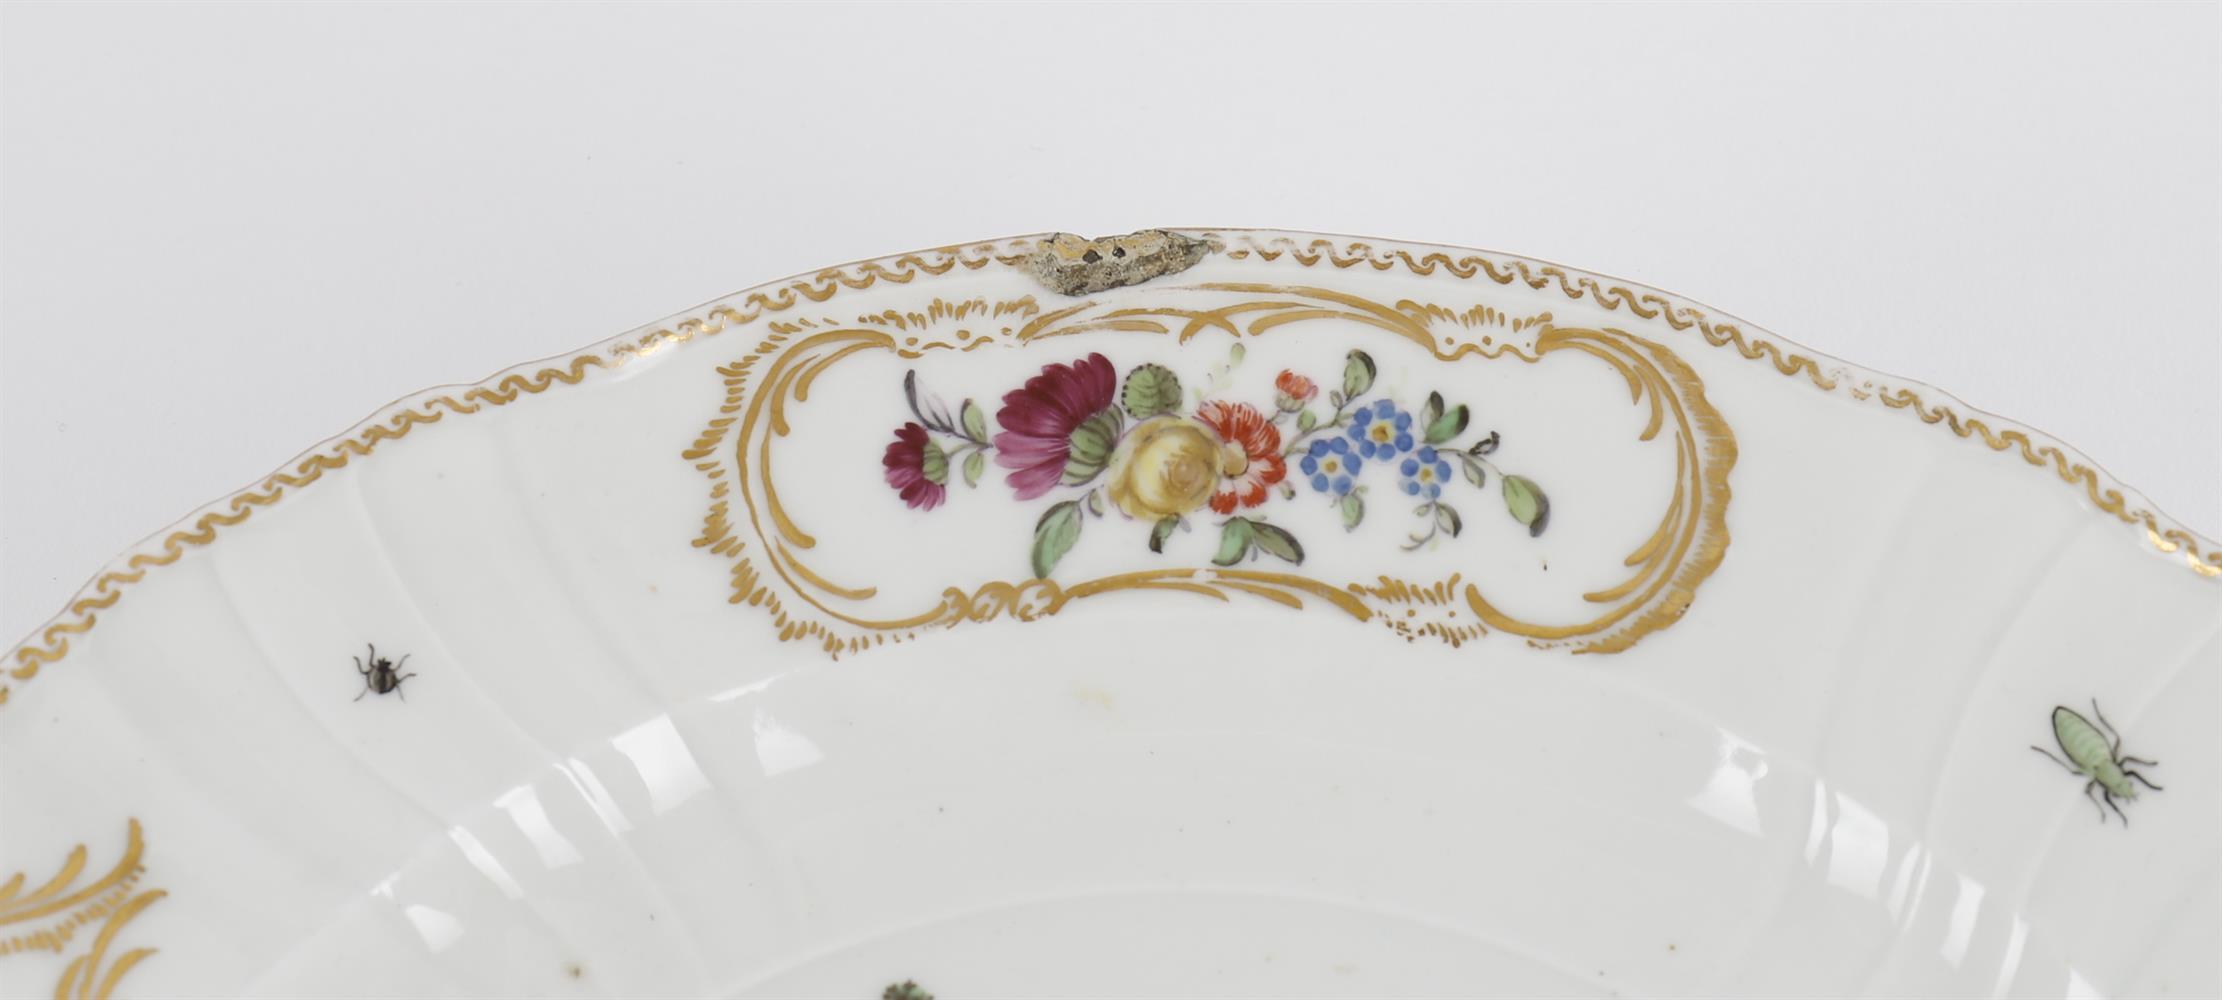 Hambridge Sale (Timed Online Auction ending 13 May)